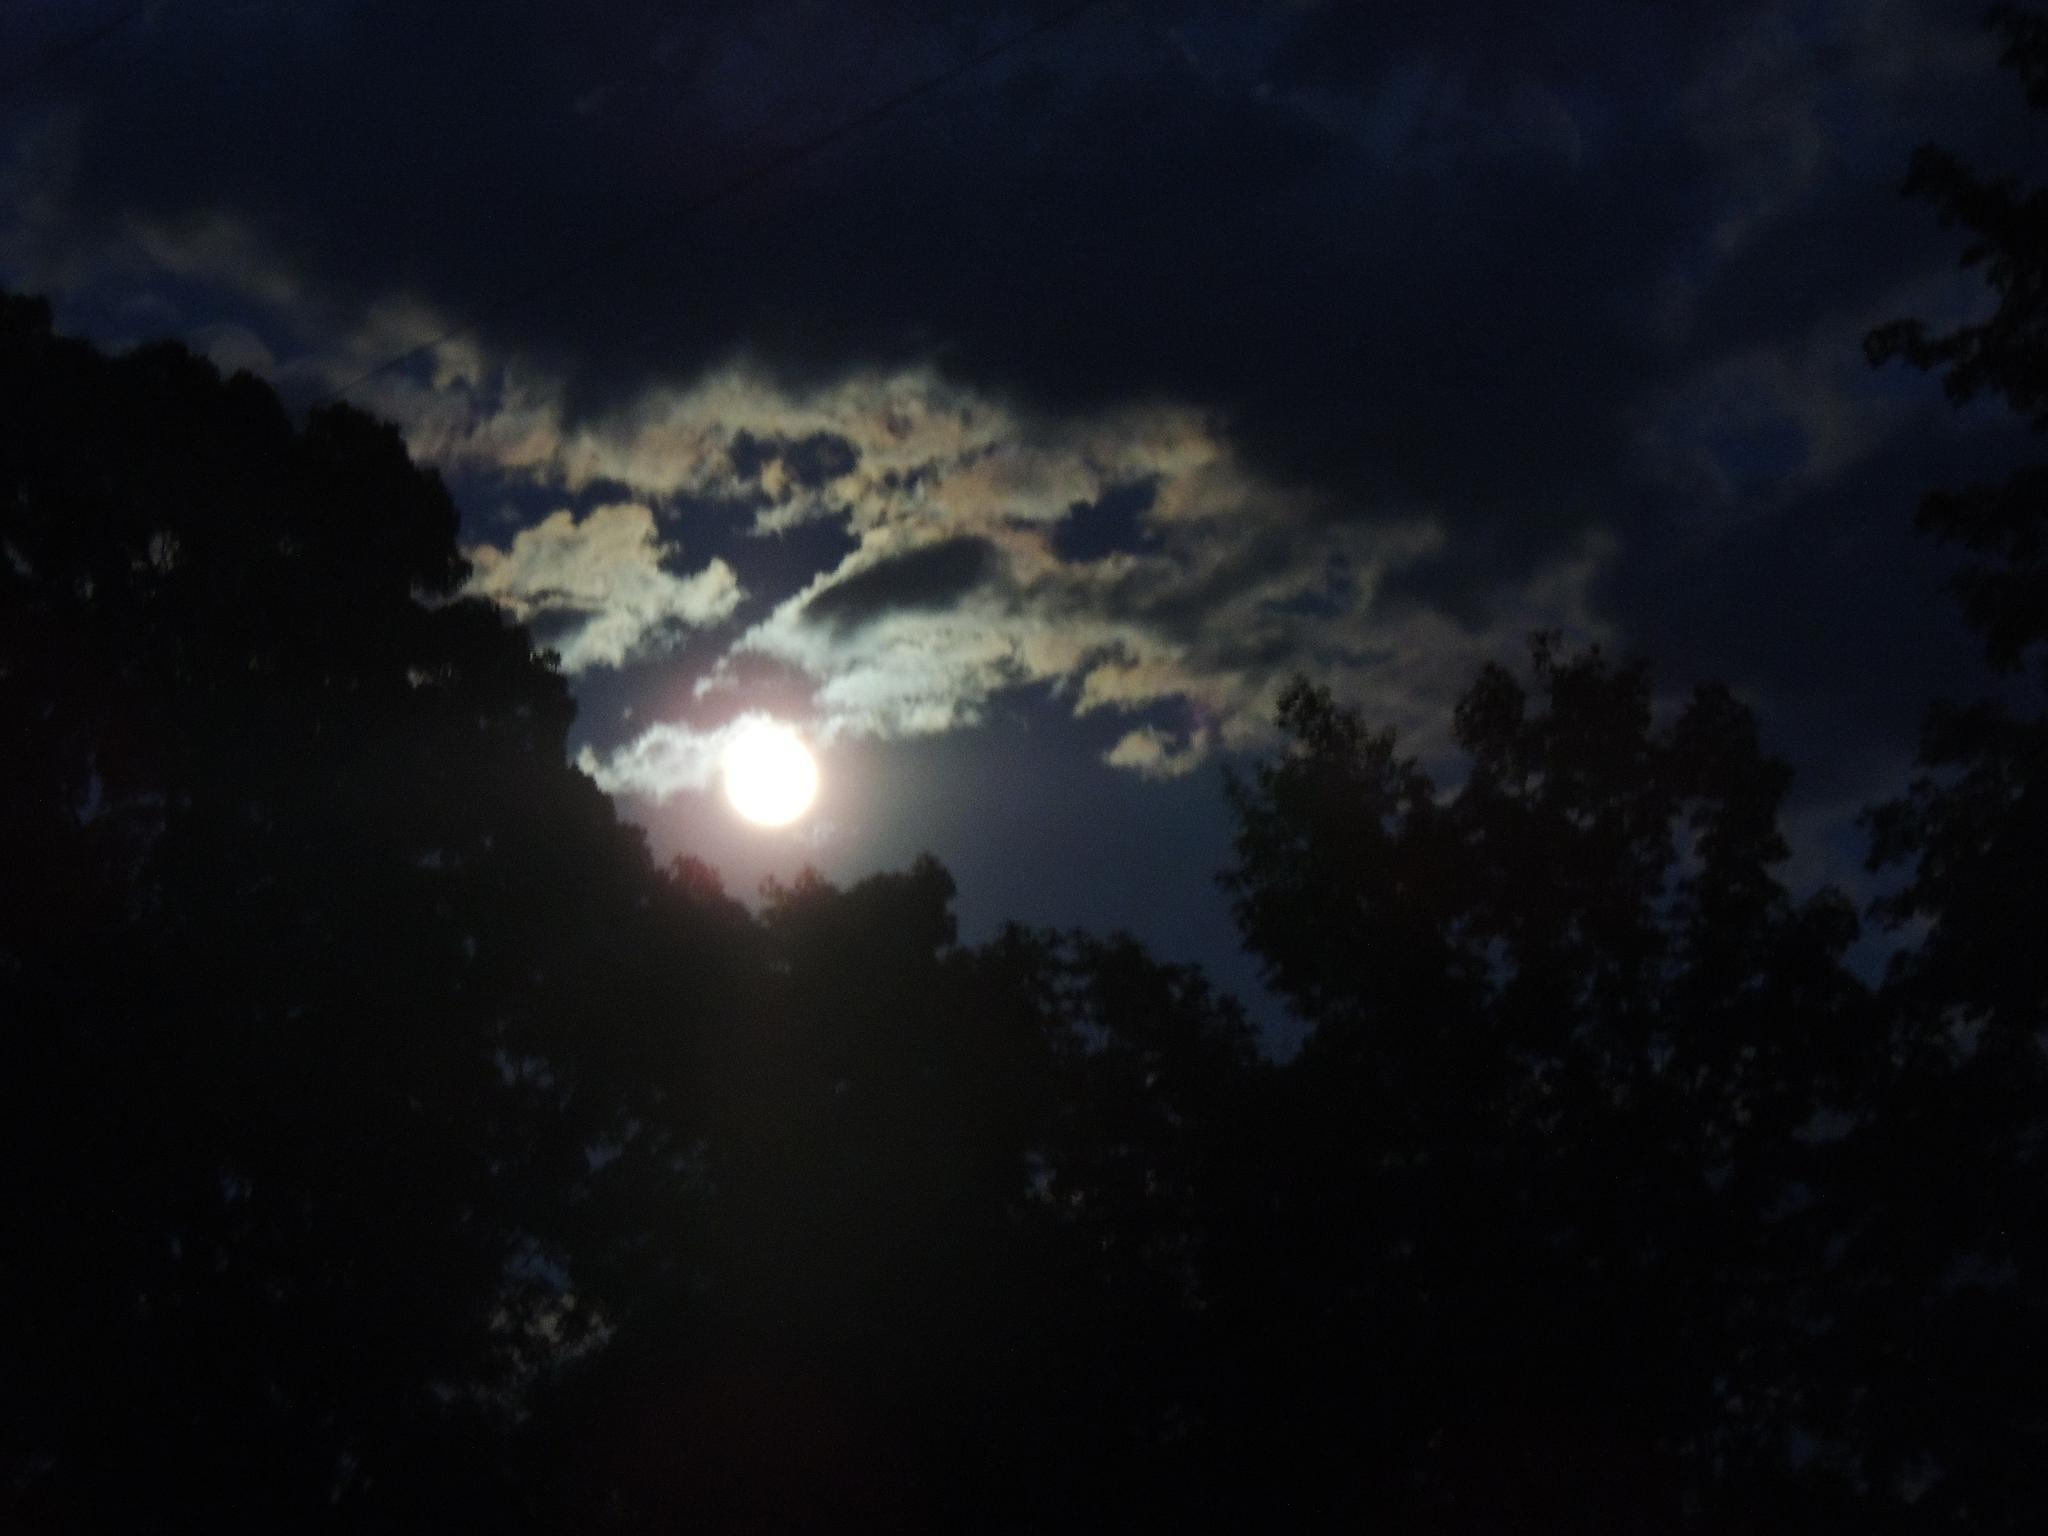 blue moon by robbin.allen.nevills